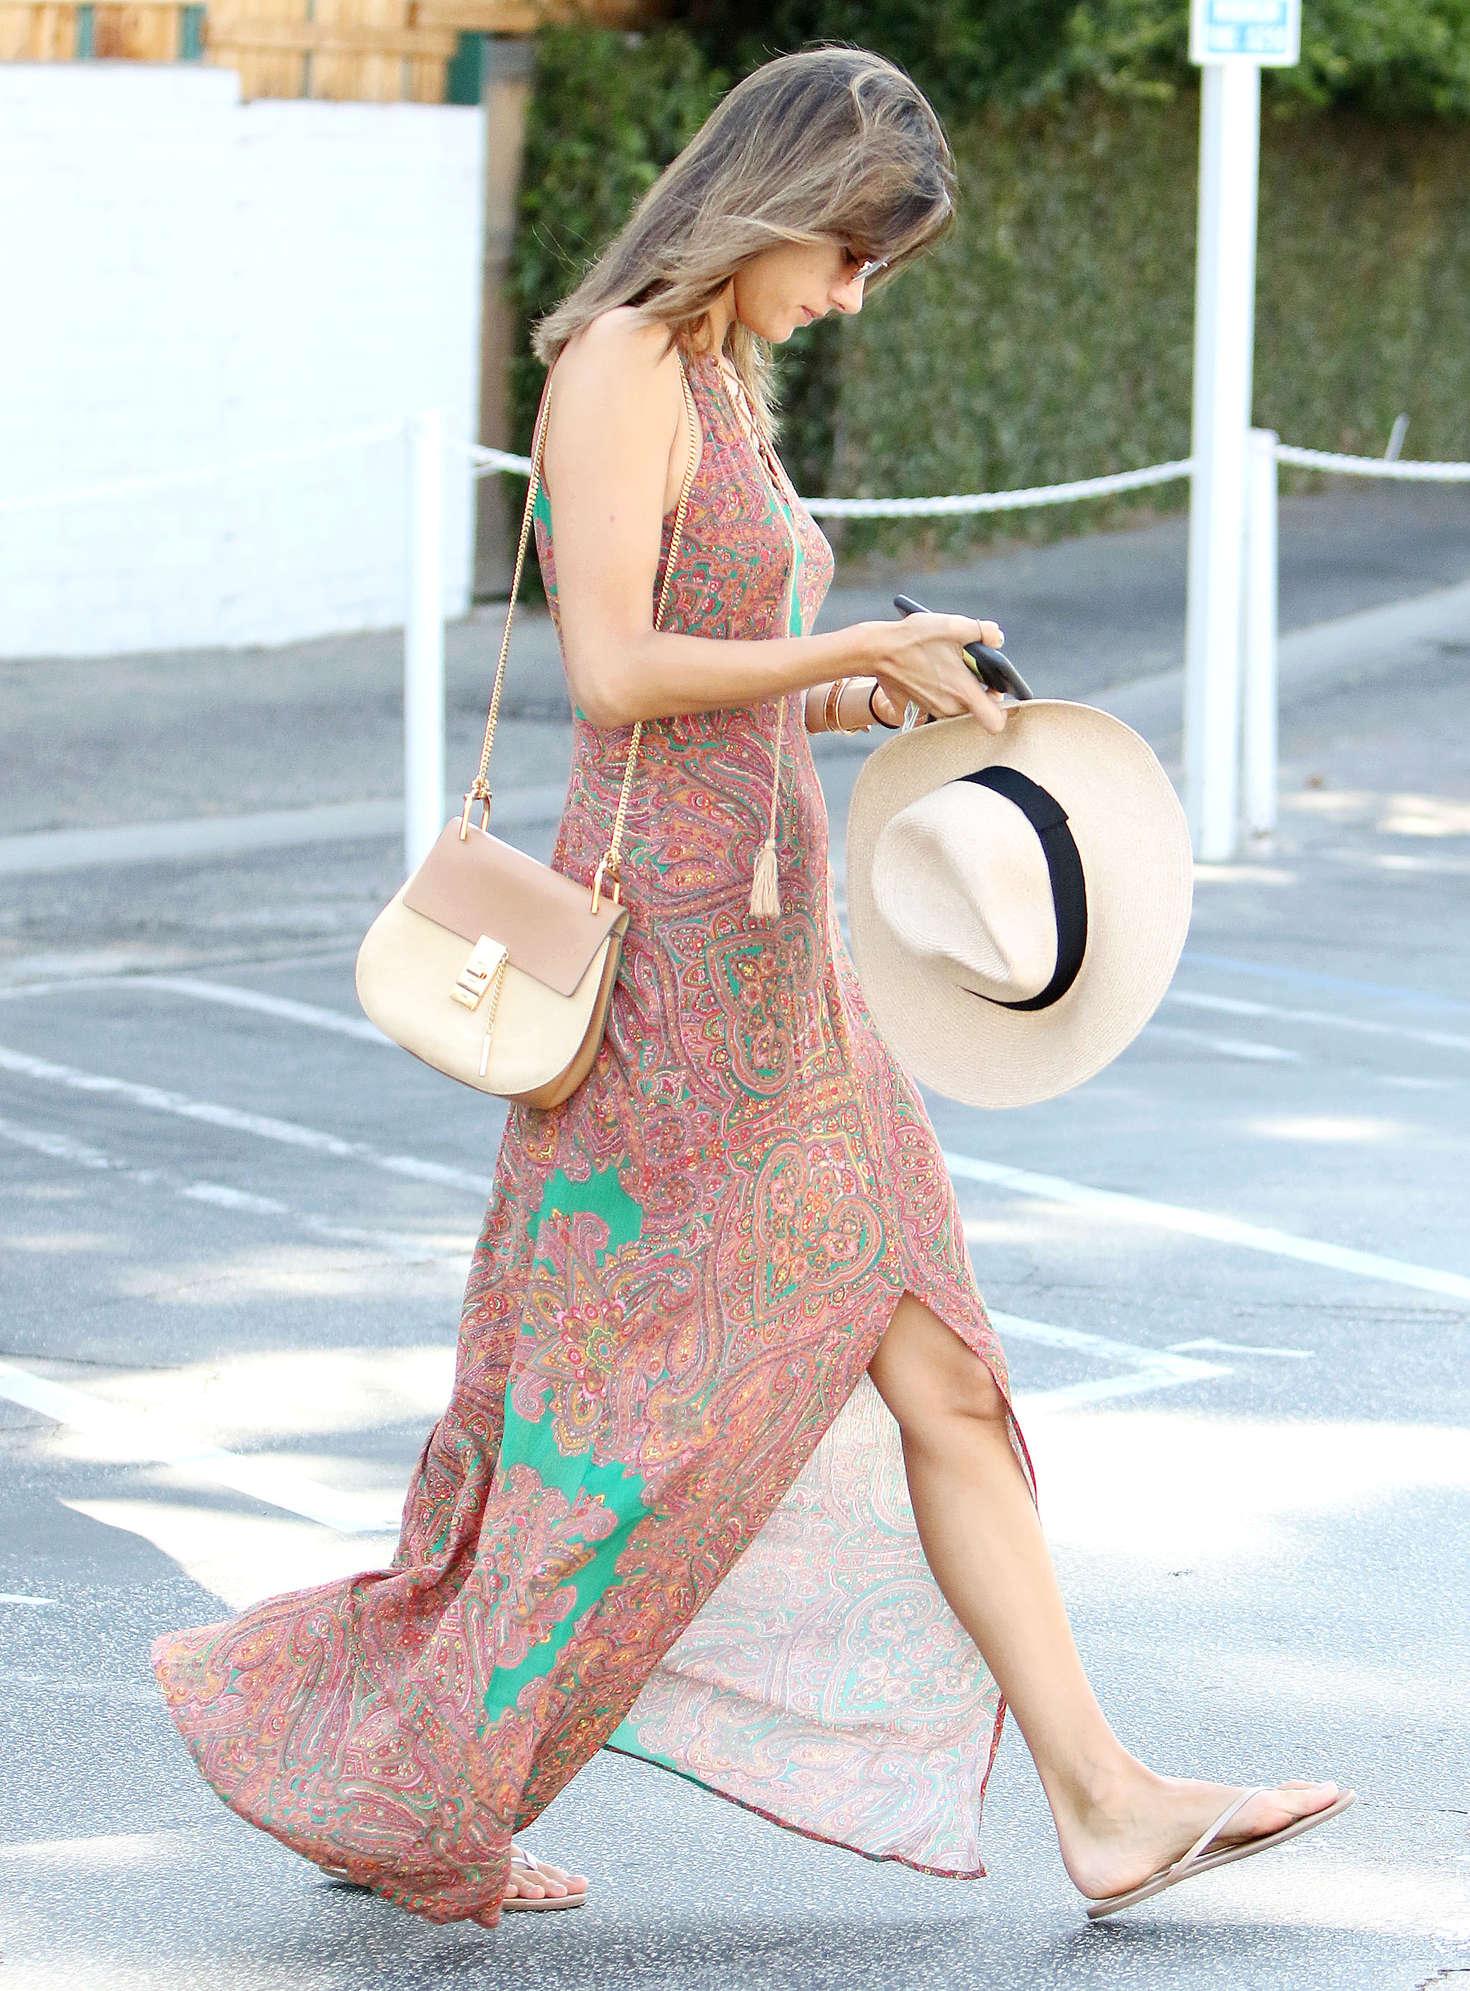 Alessandra Ambrosio 2016 : Alessandra Ambrosio in Long Summer Dress -16